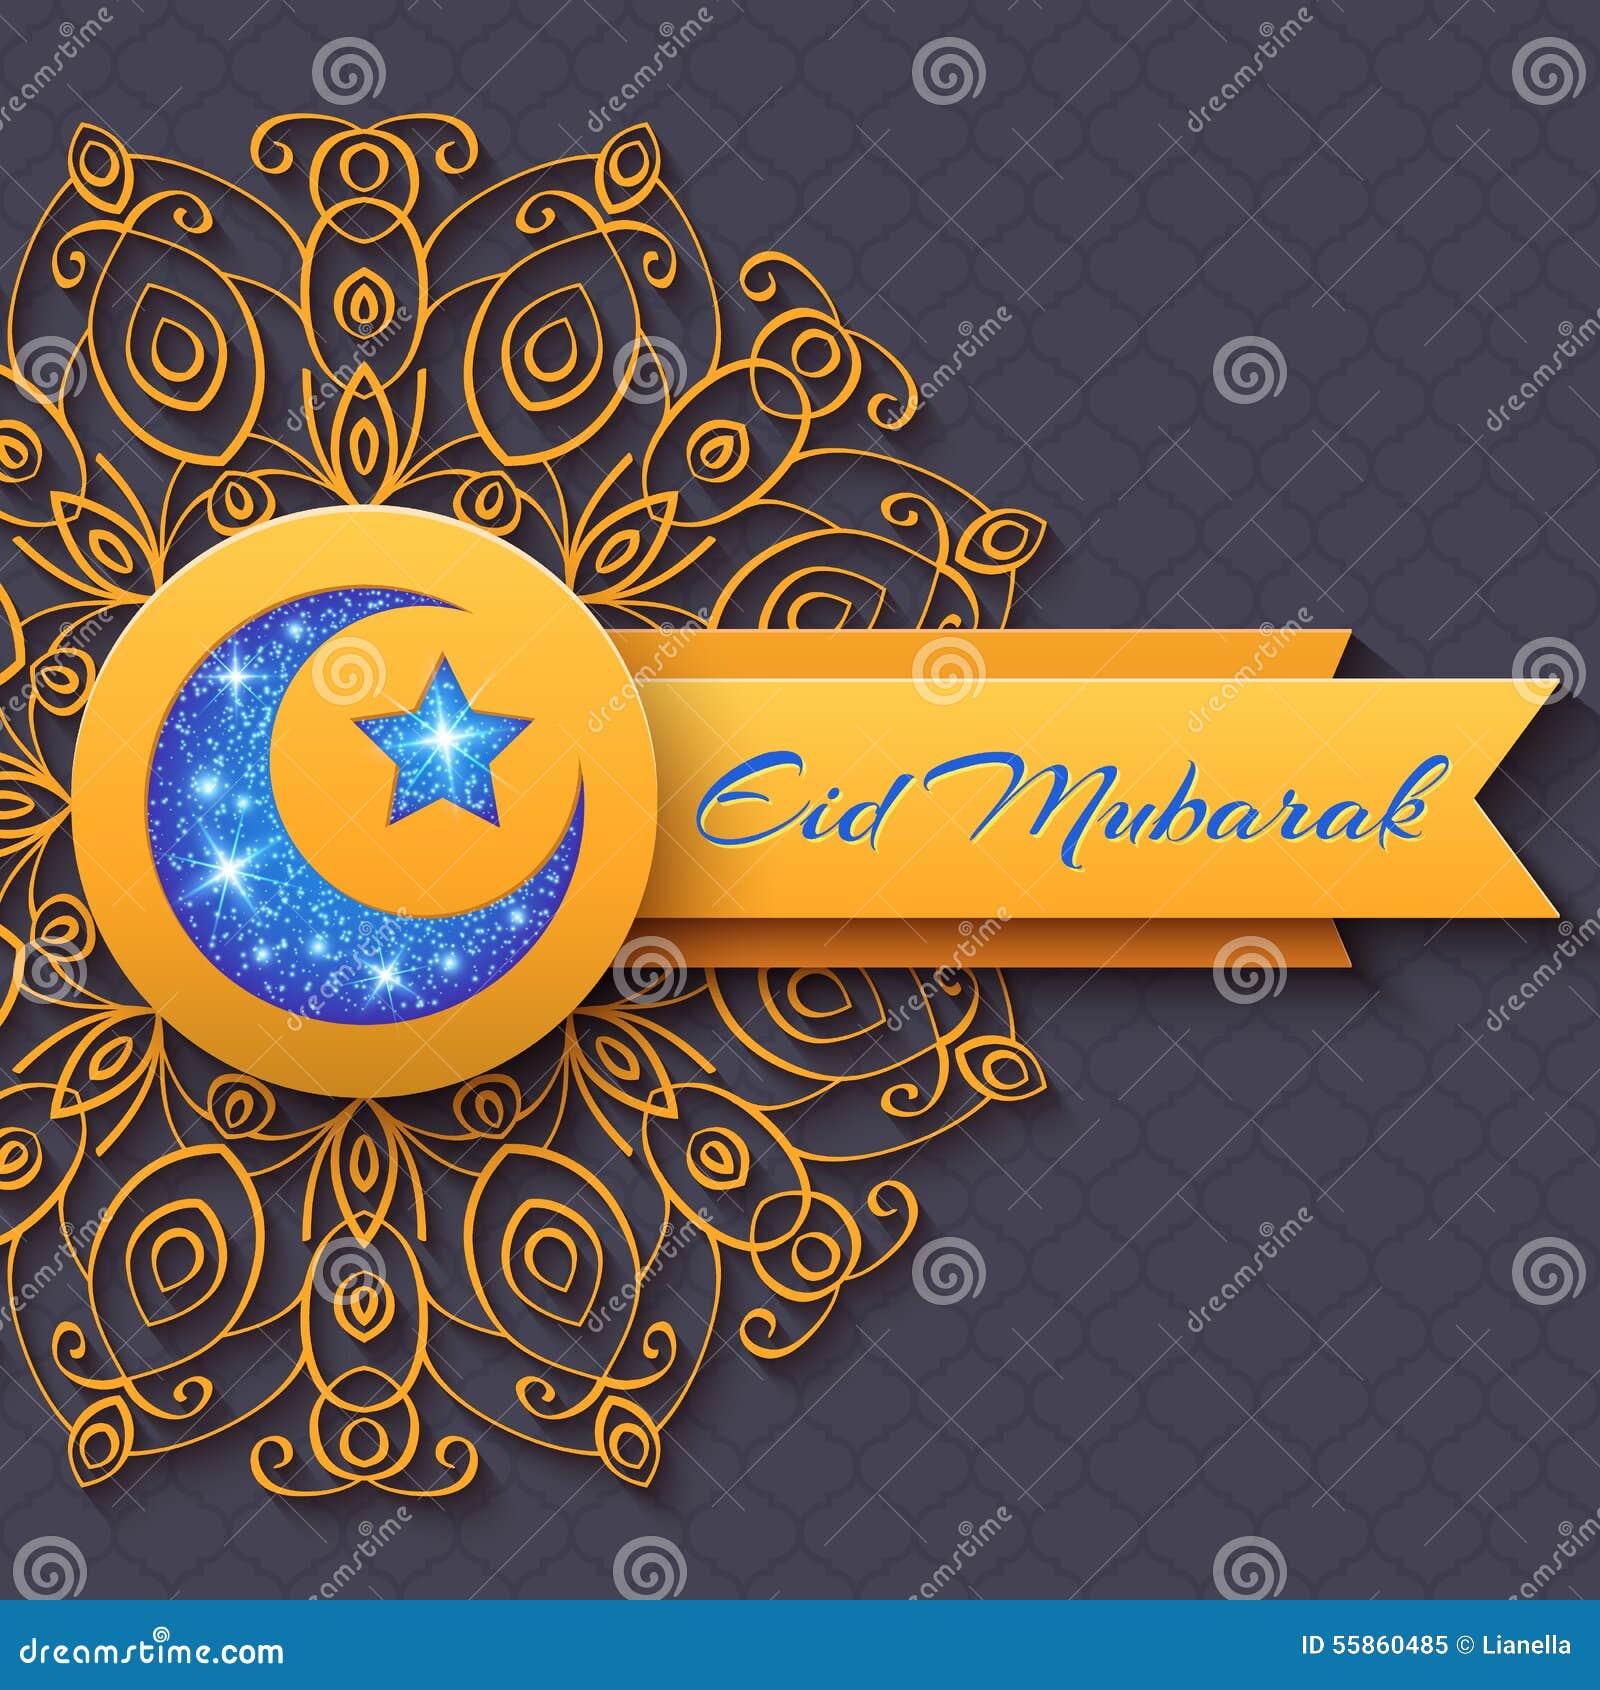 Colorful Greeting Card Eid Mubarak Stock Vector Illustration Of